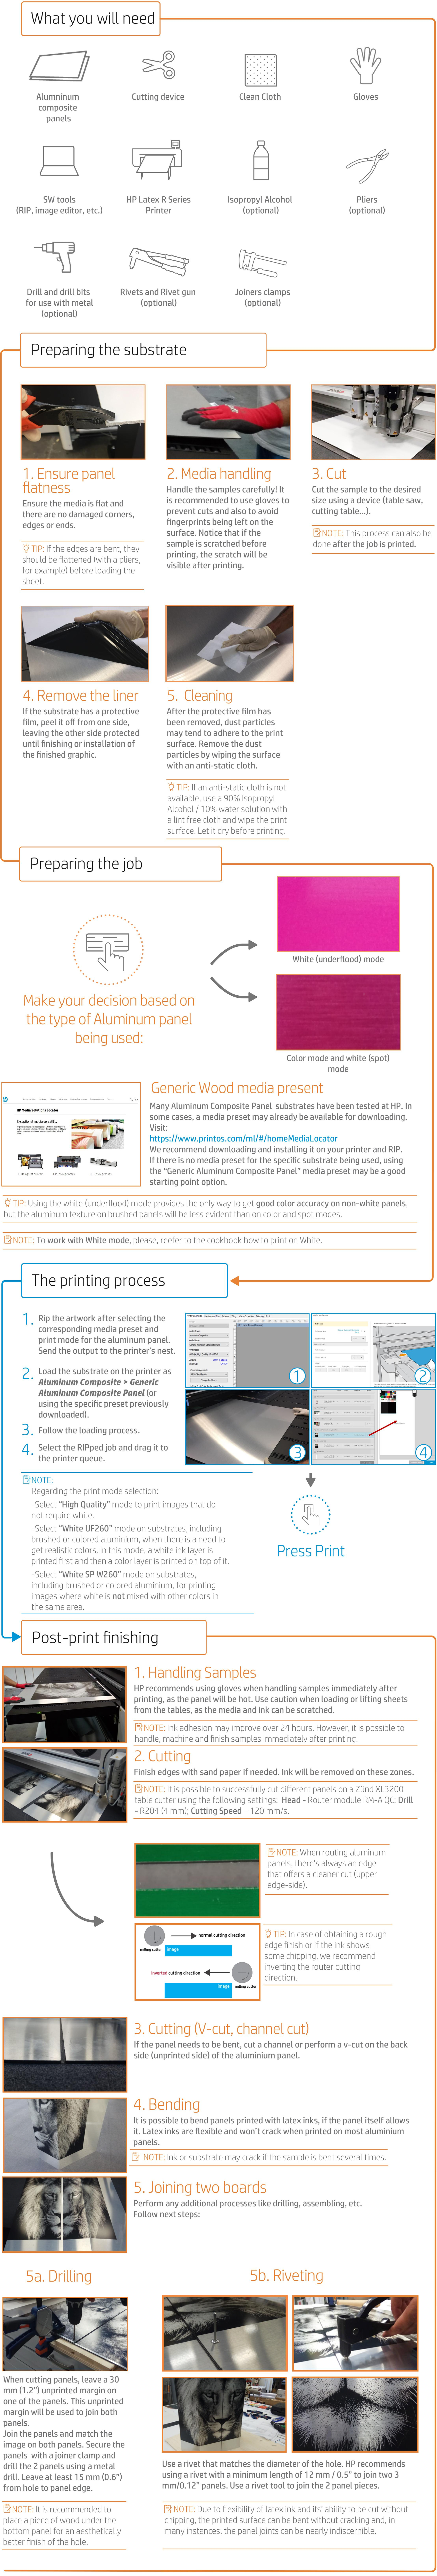 HP Latex Knowledge Center - How to print on aluminium composite